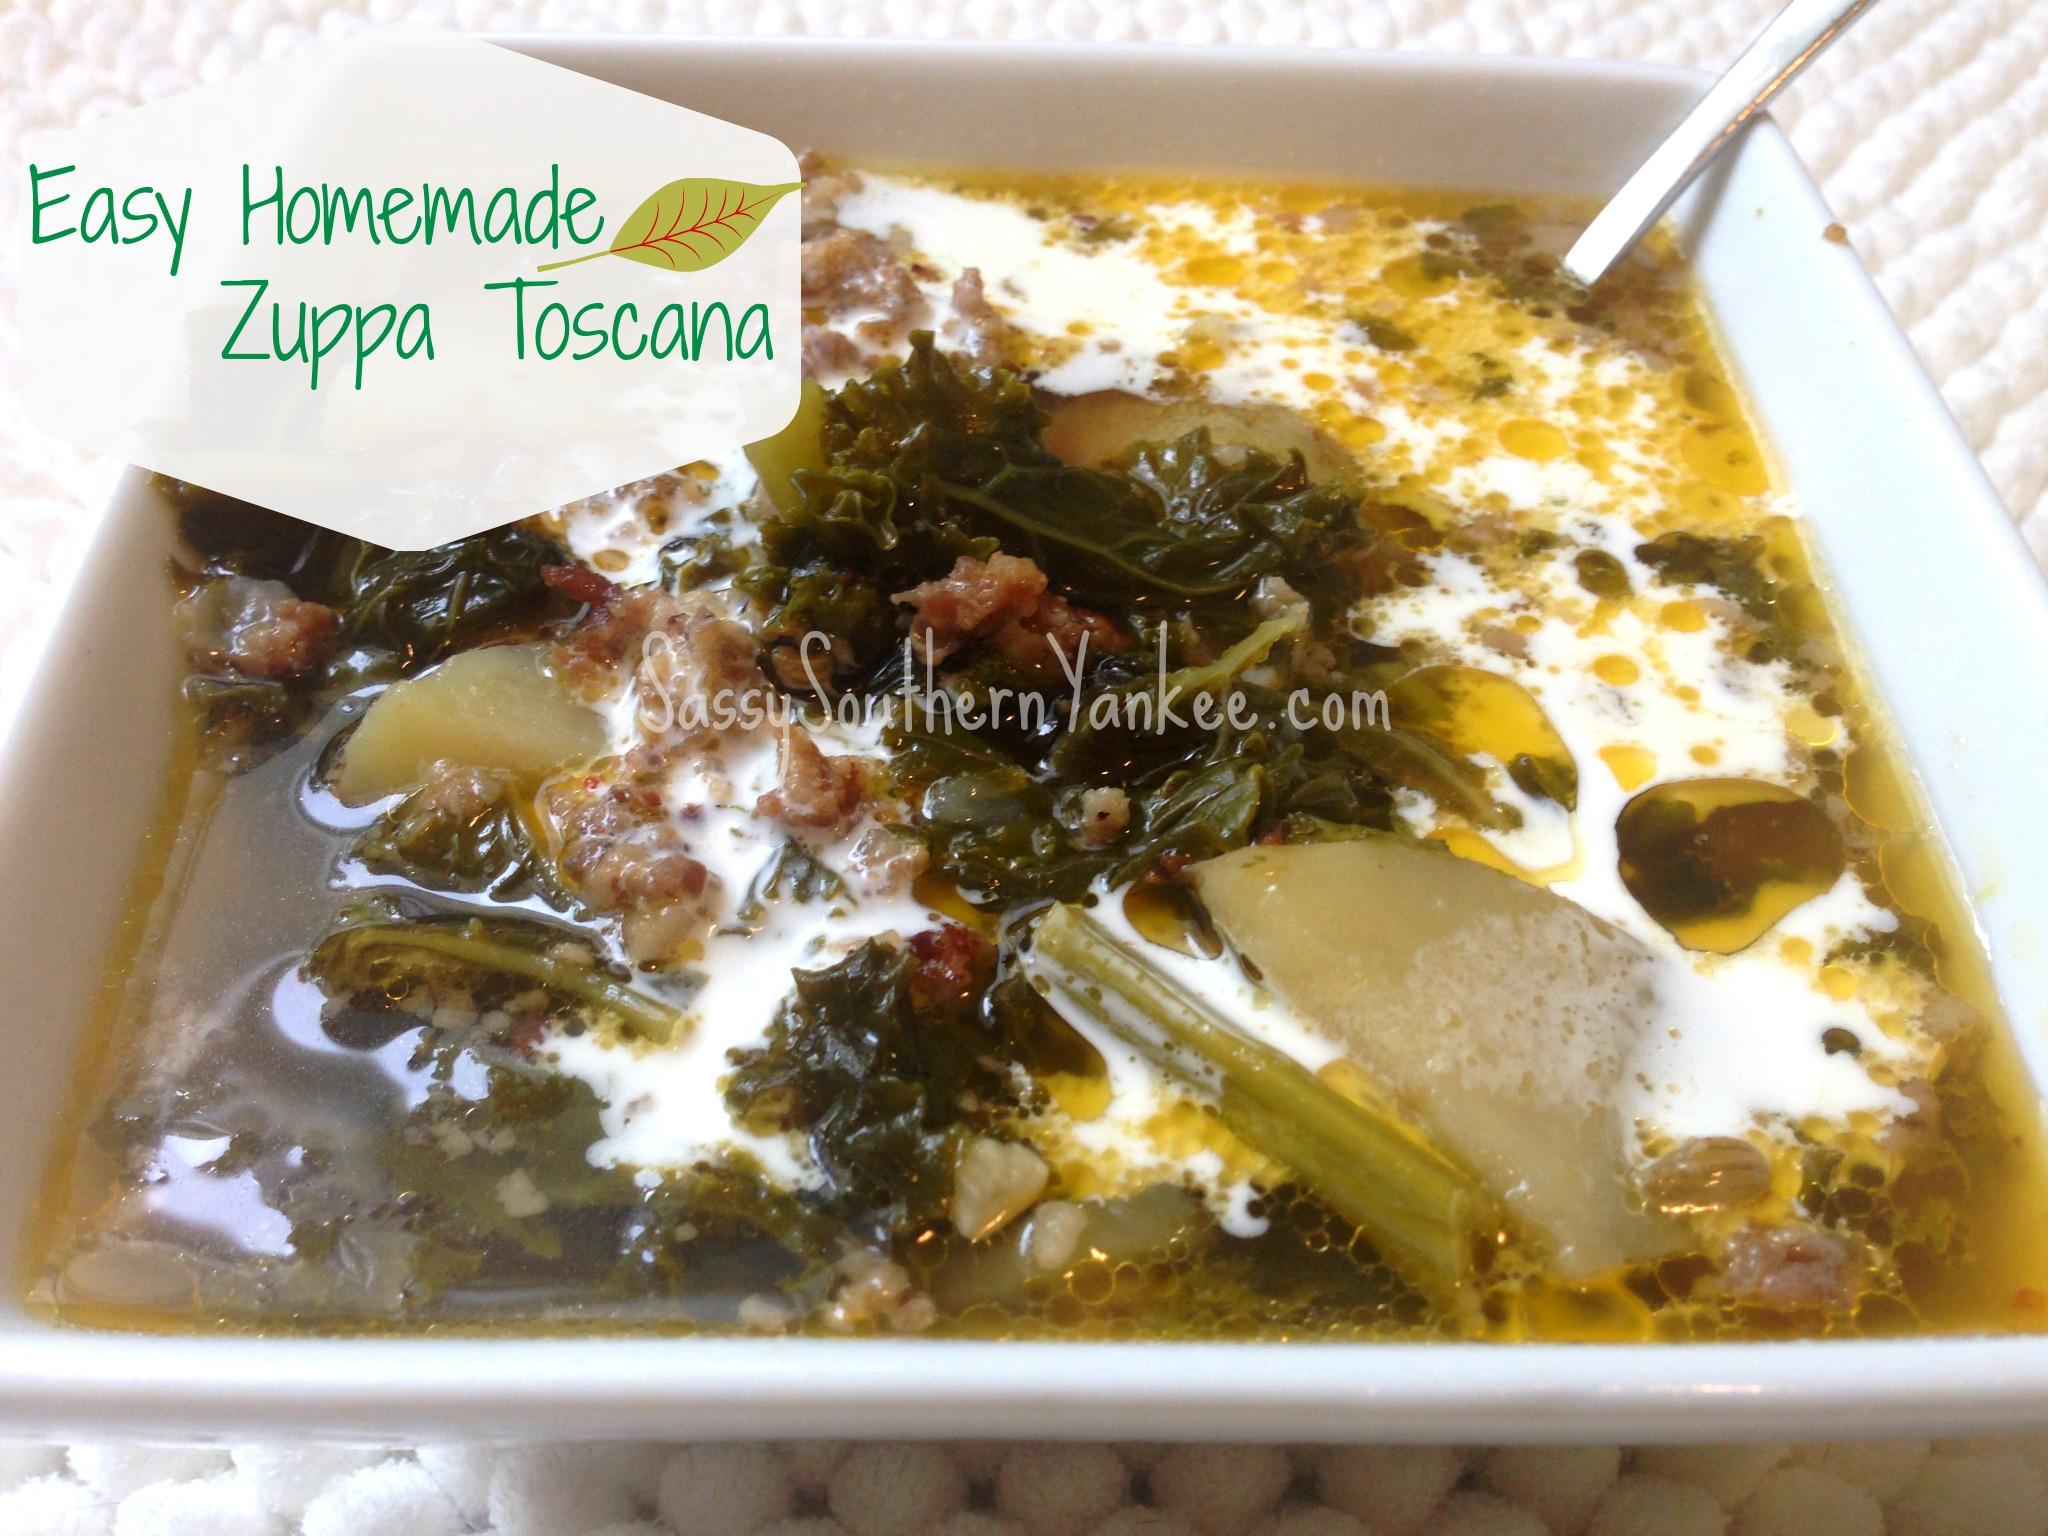 Easy Homemade Zuppa Toscana | Sassy Southern Yankee